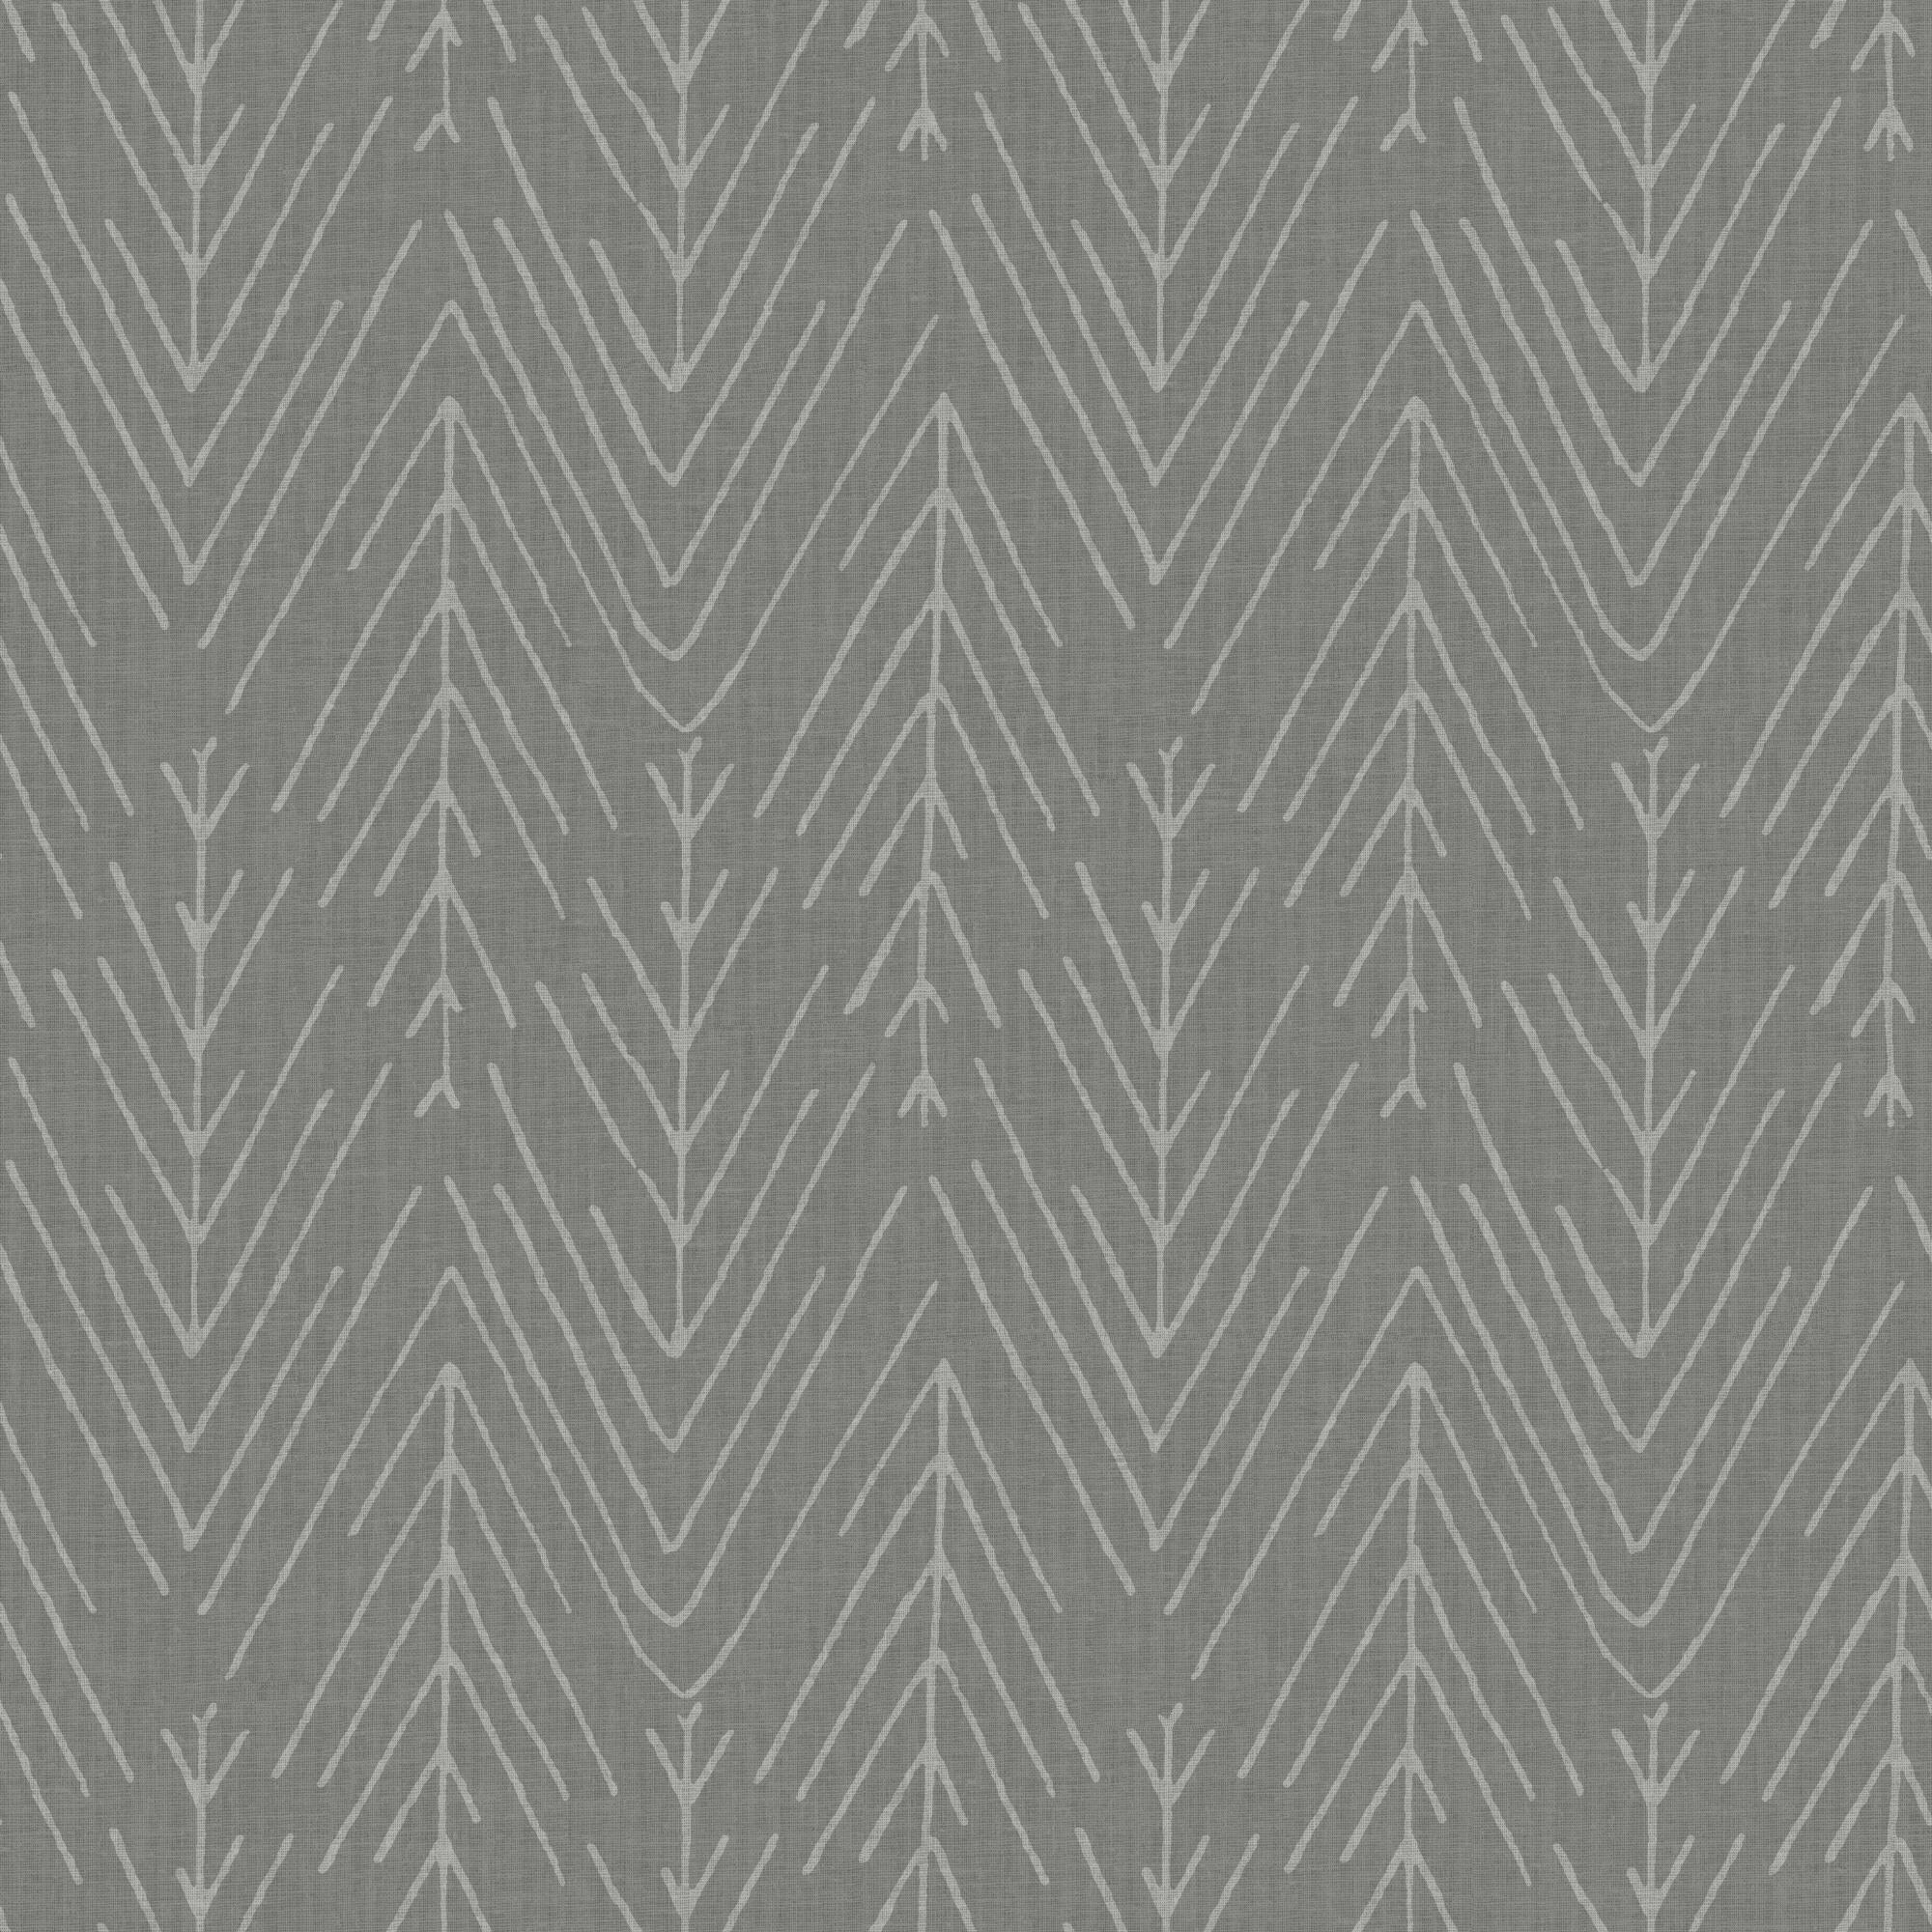 Gray Twig Herringbone Peel And Stick Wallpaper By World Market In 2021 Peel And Stick Wallpaper Wallpaper Roll Room Visualizer